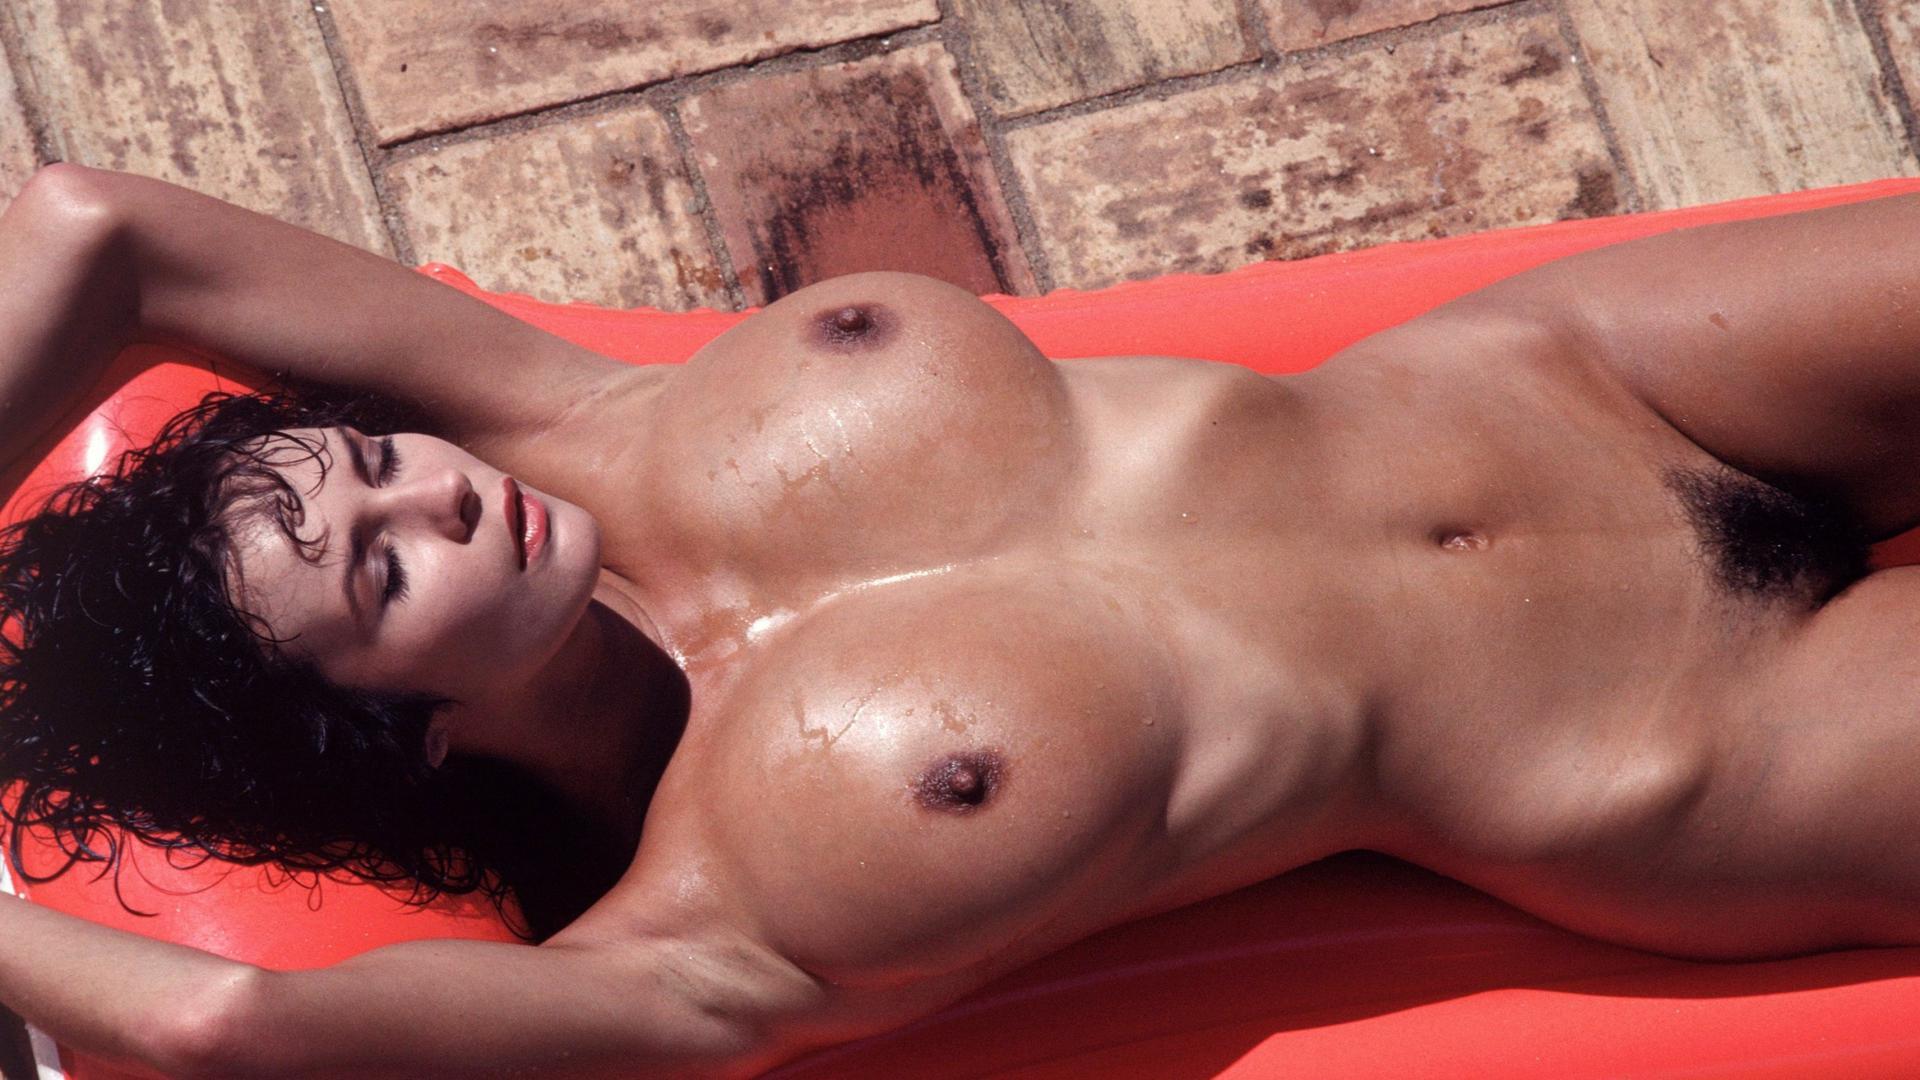 With vigina donna ewing naked redding porn